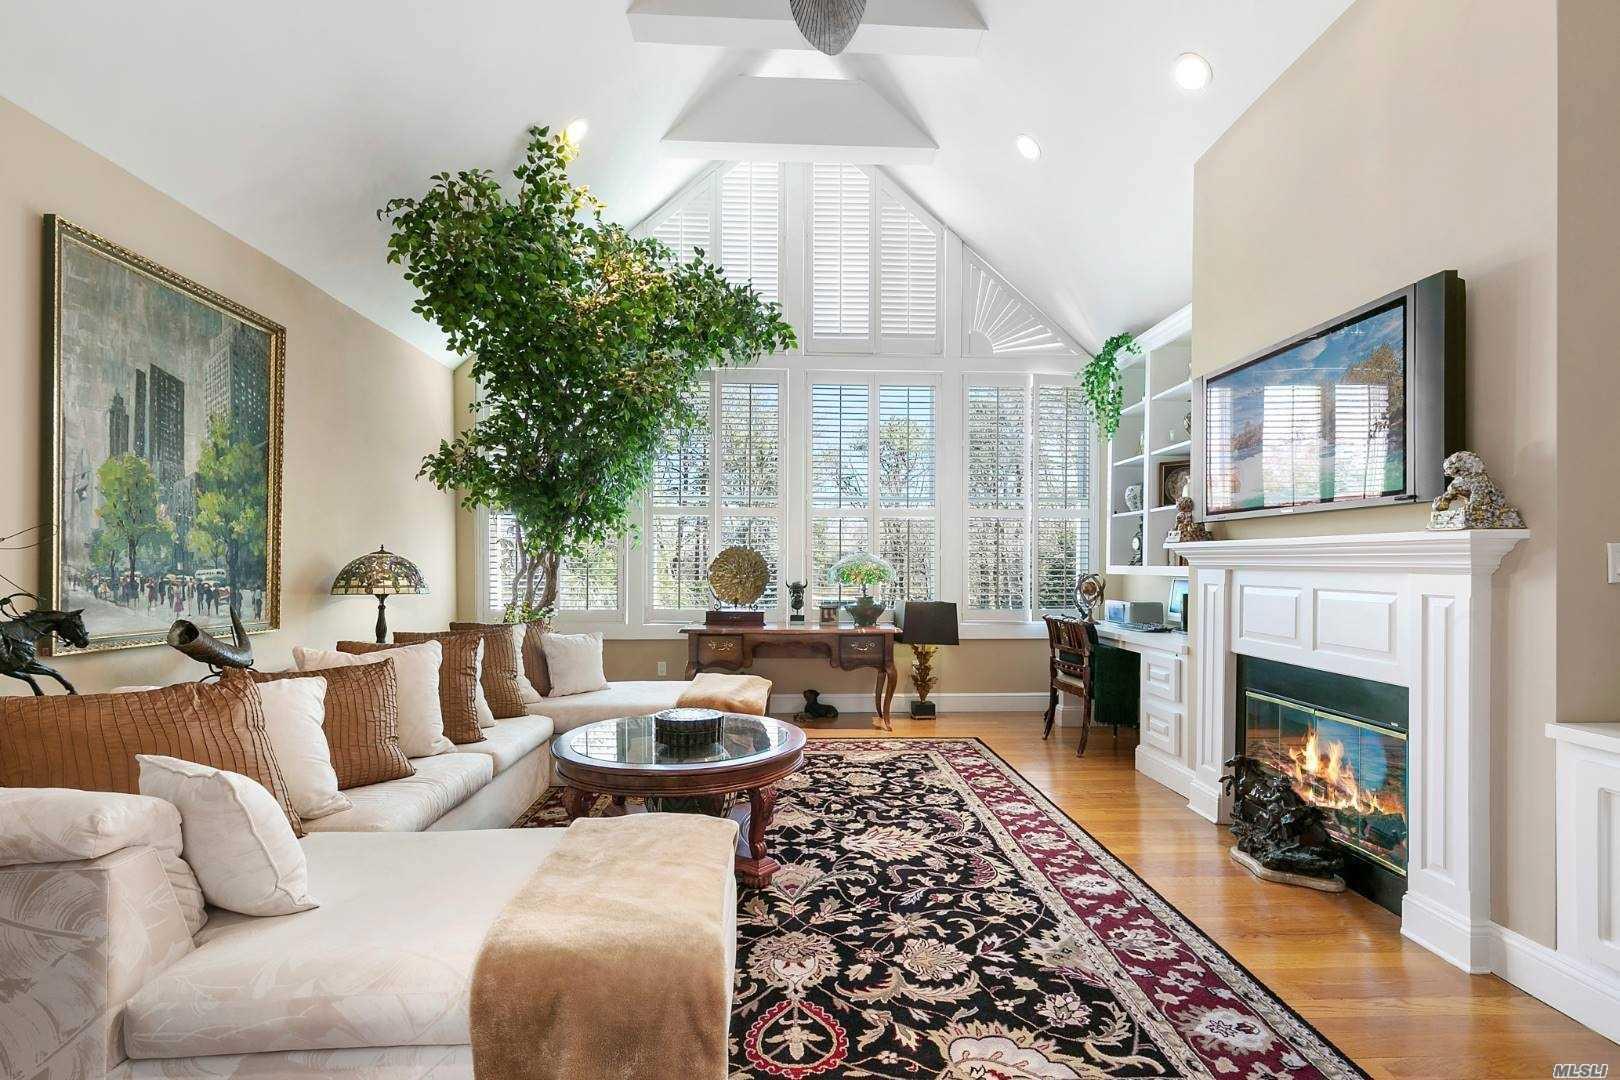 40 Cedar Lane, Remsenburg, NY 11 Southampton, NY 11960